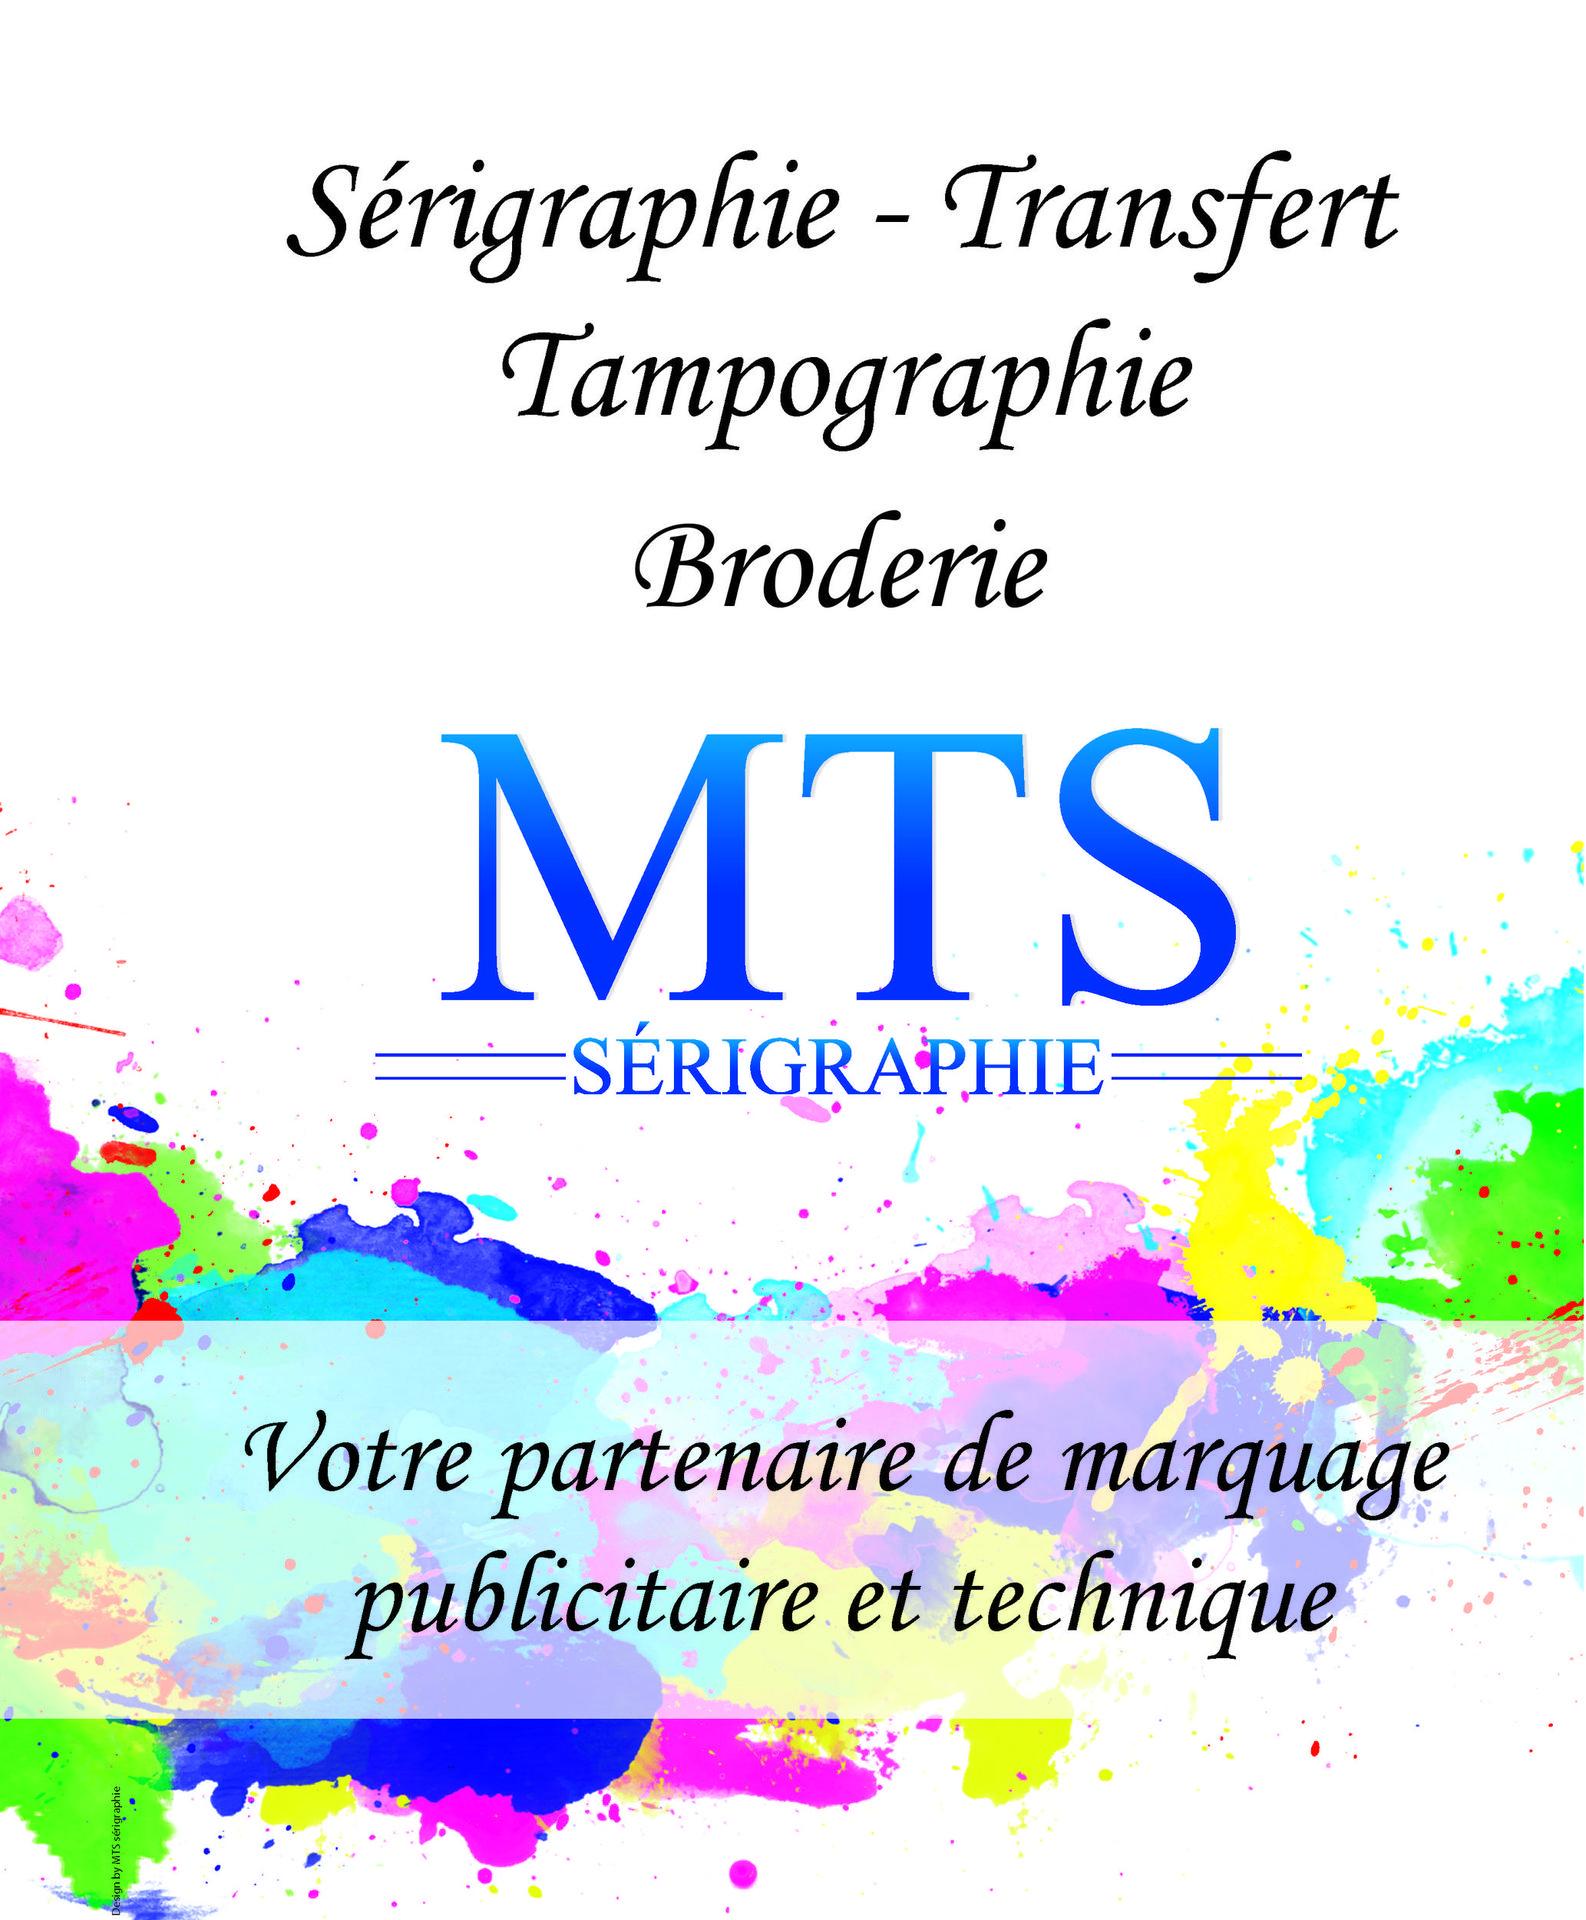 MTS Serigraphie flocage